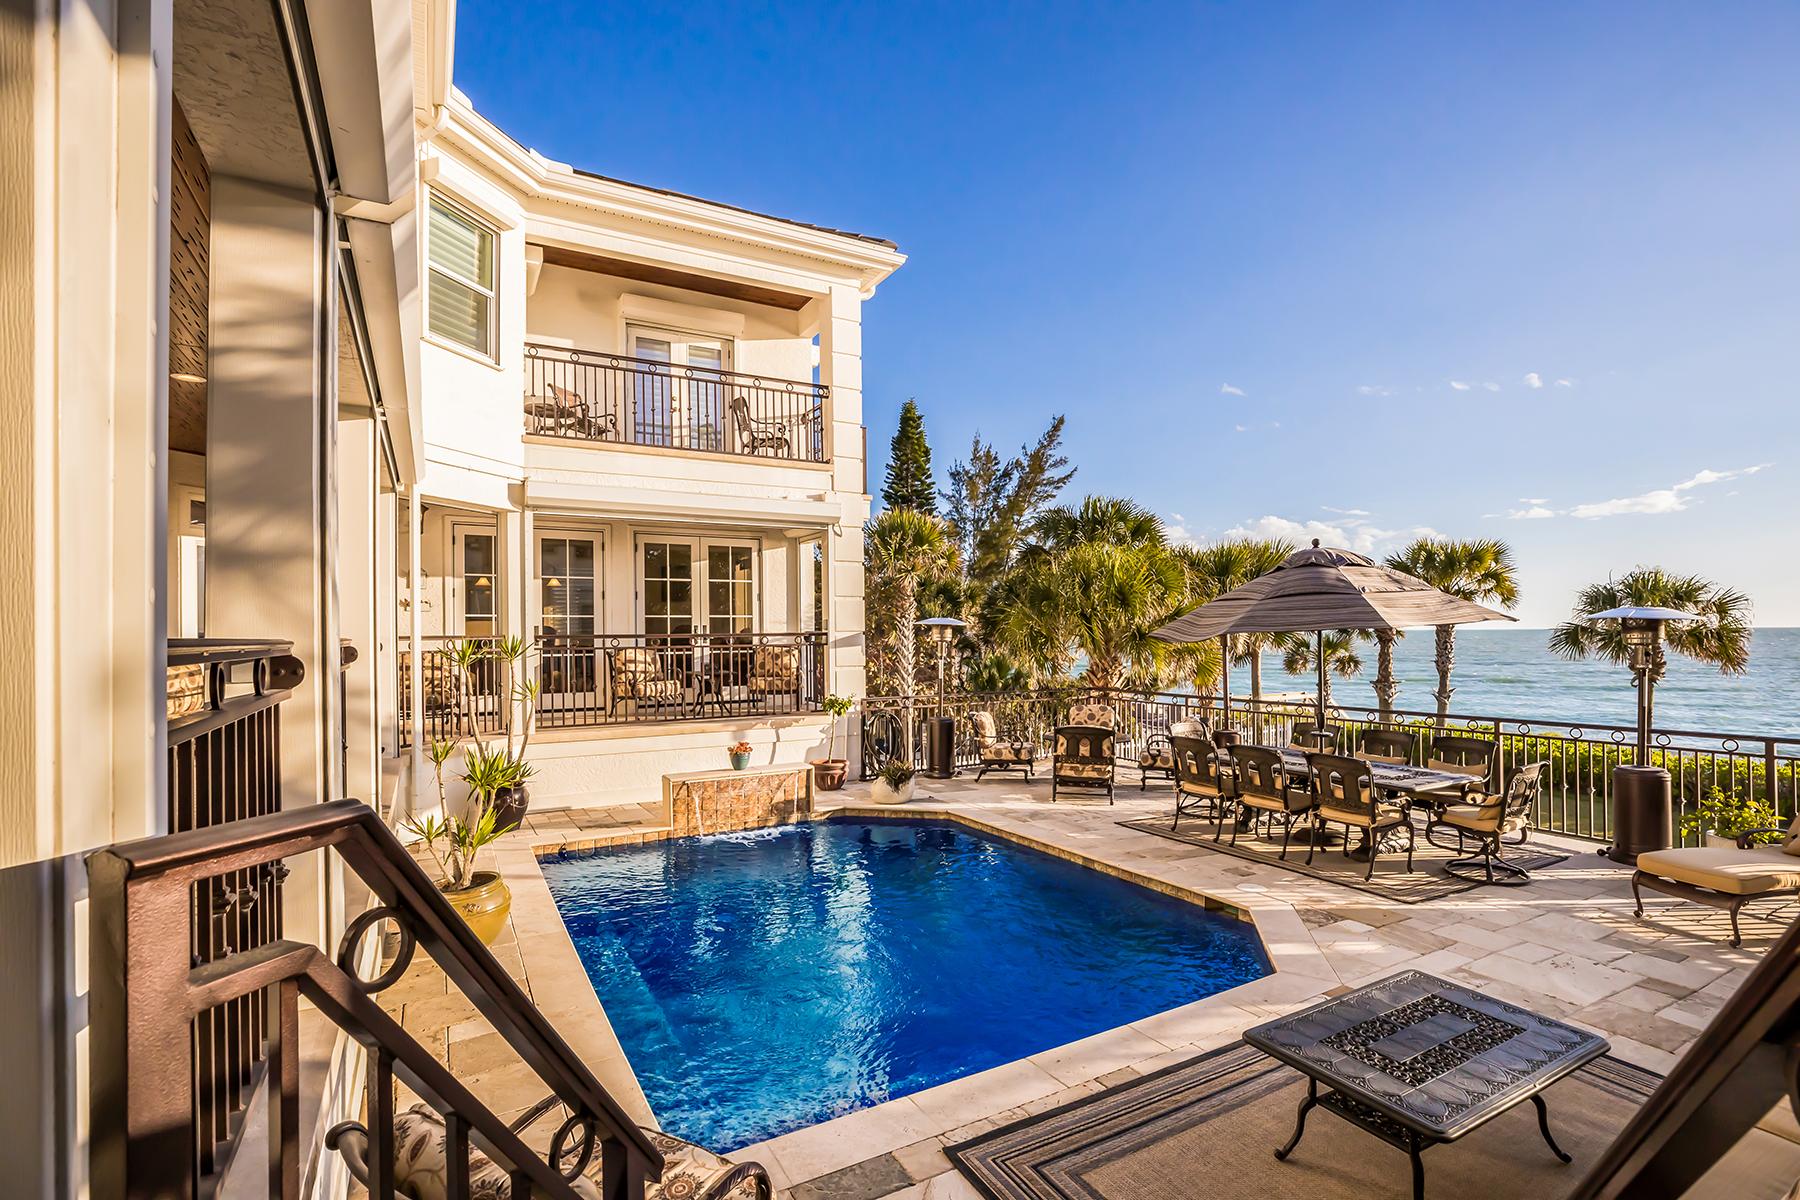 Single Family Homes for Sale at 4009 Casey Key Rd Nokomis, Florida 34275 United States